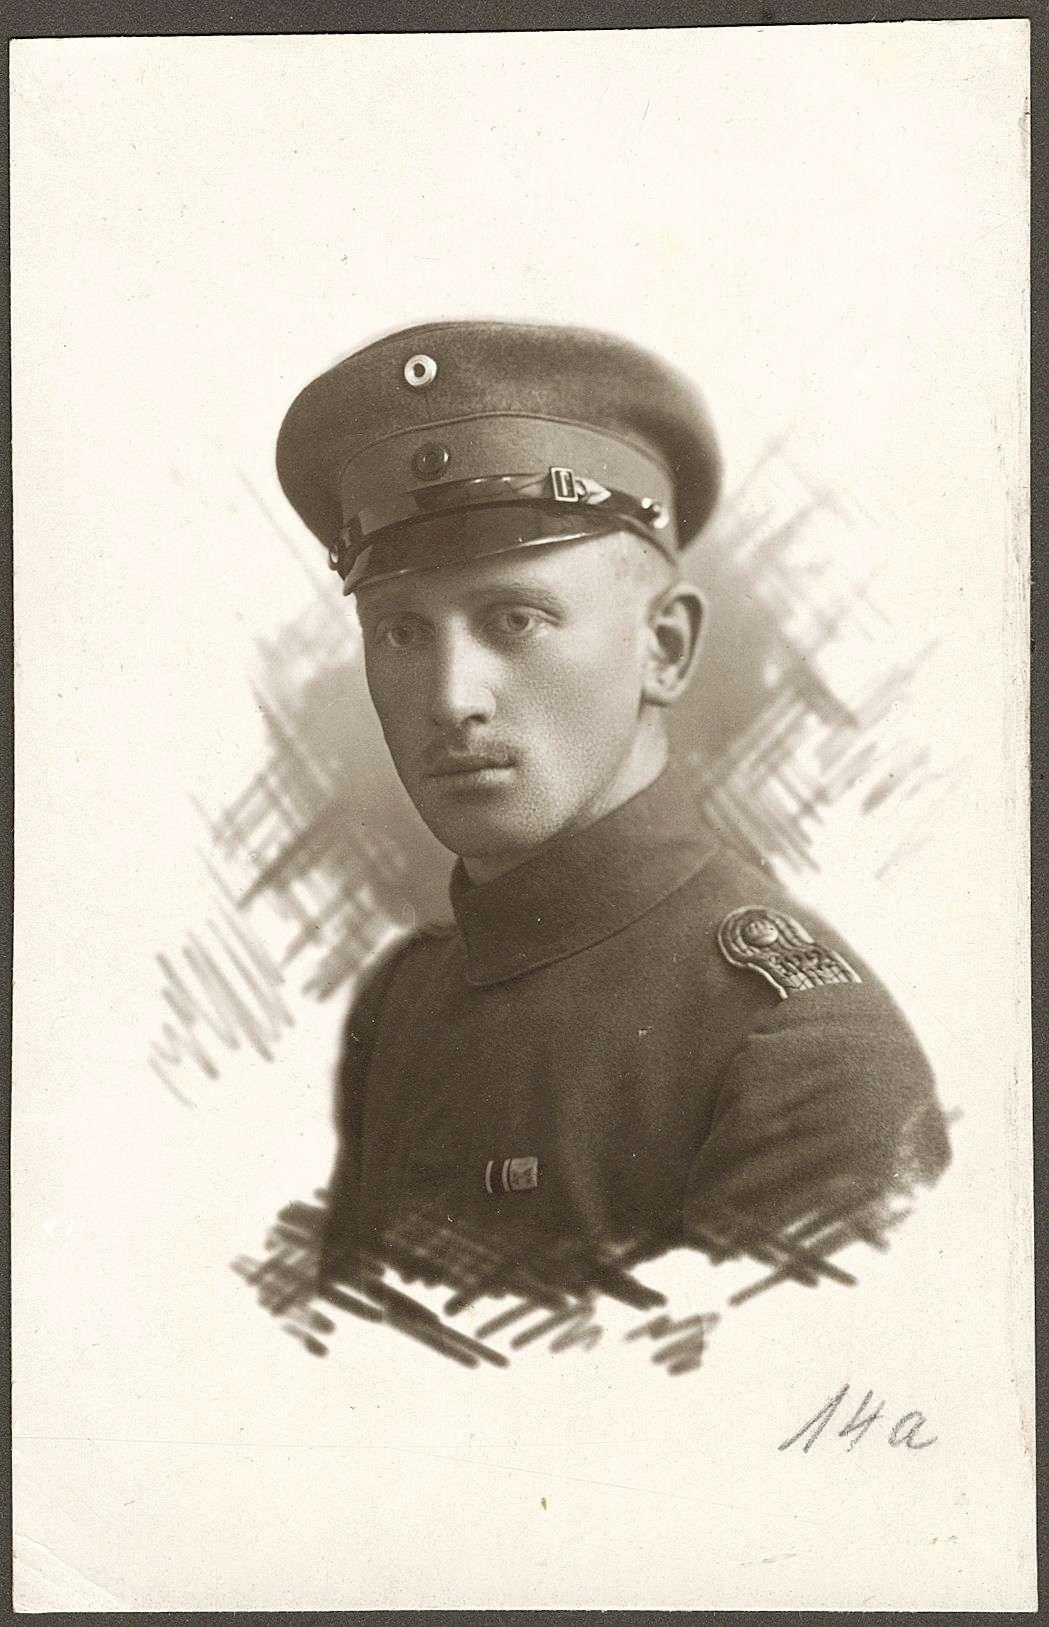 Mutschler, Paul, Bild 1